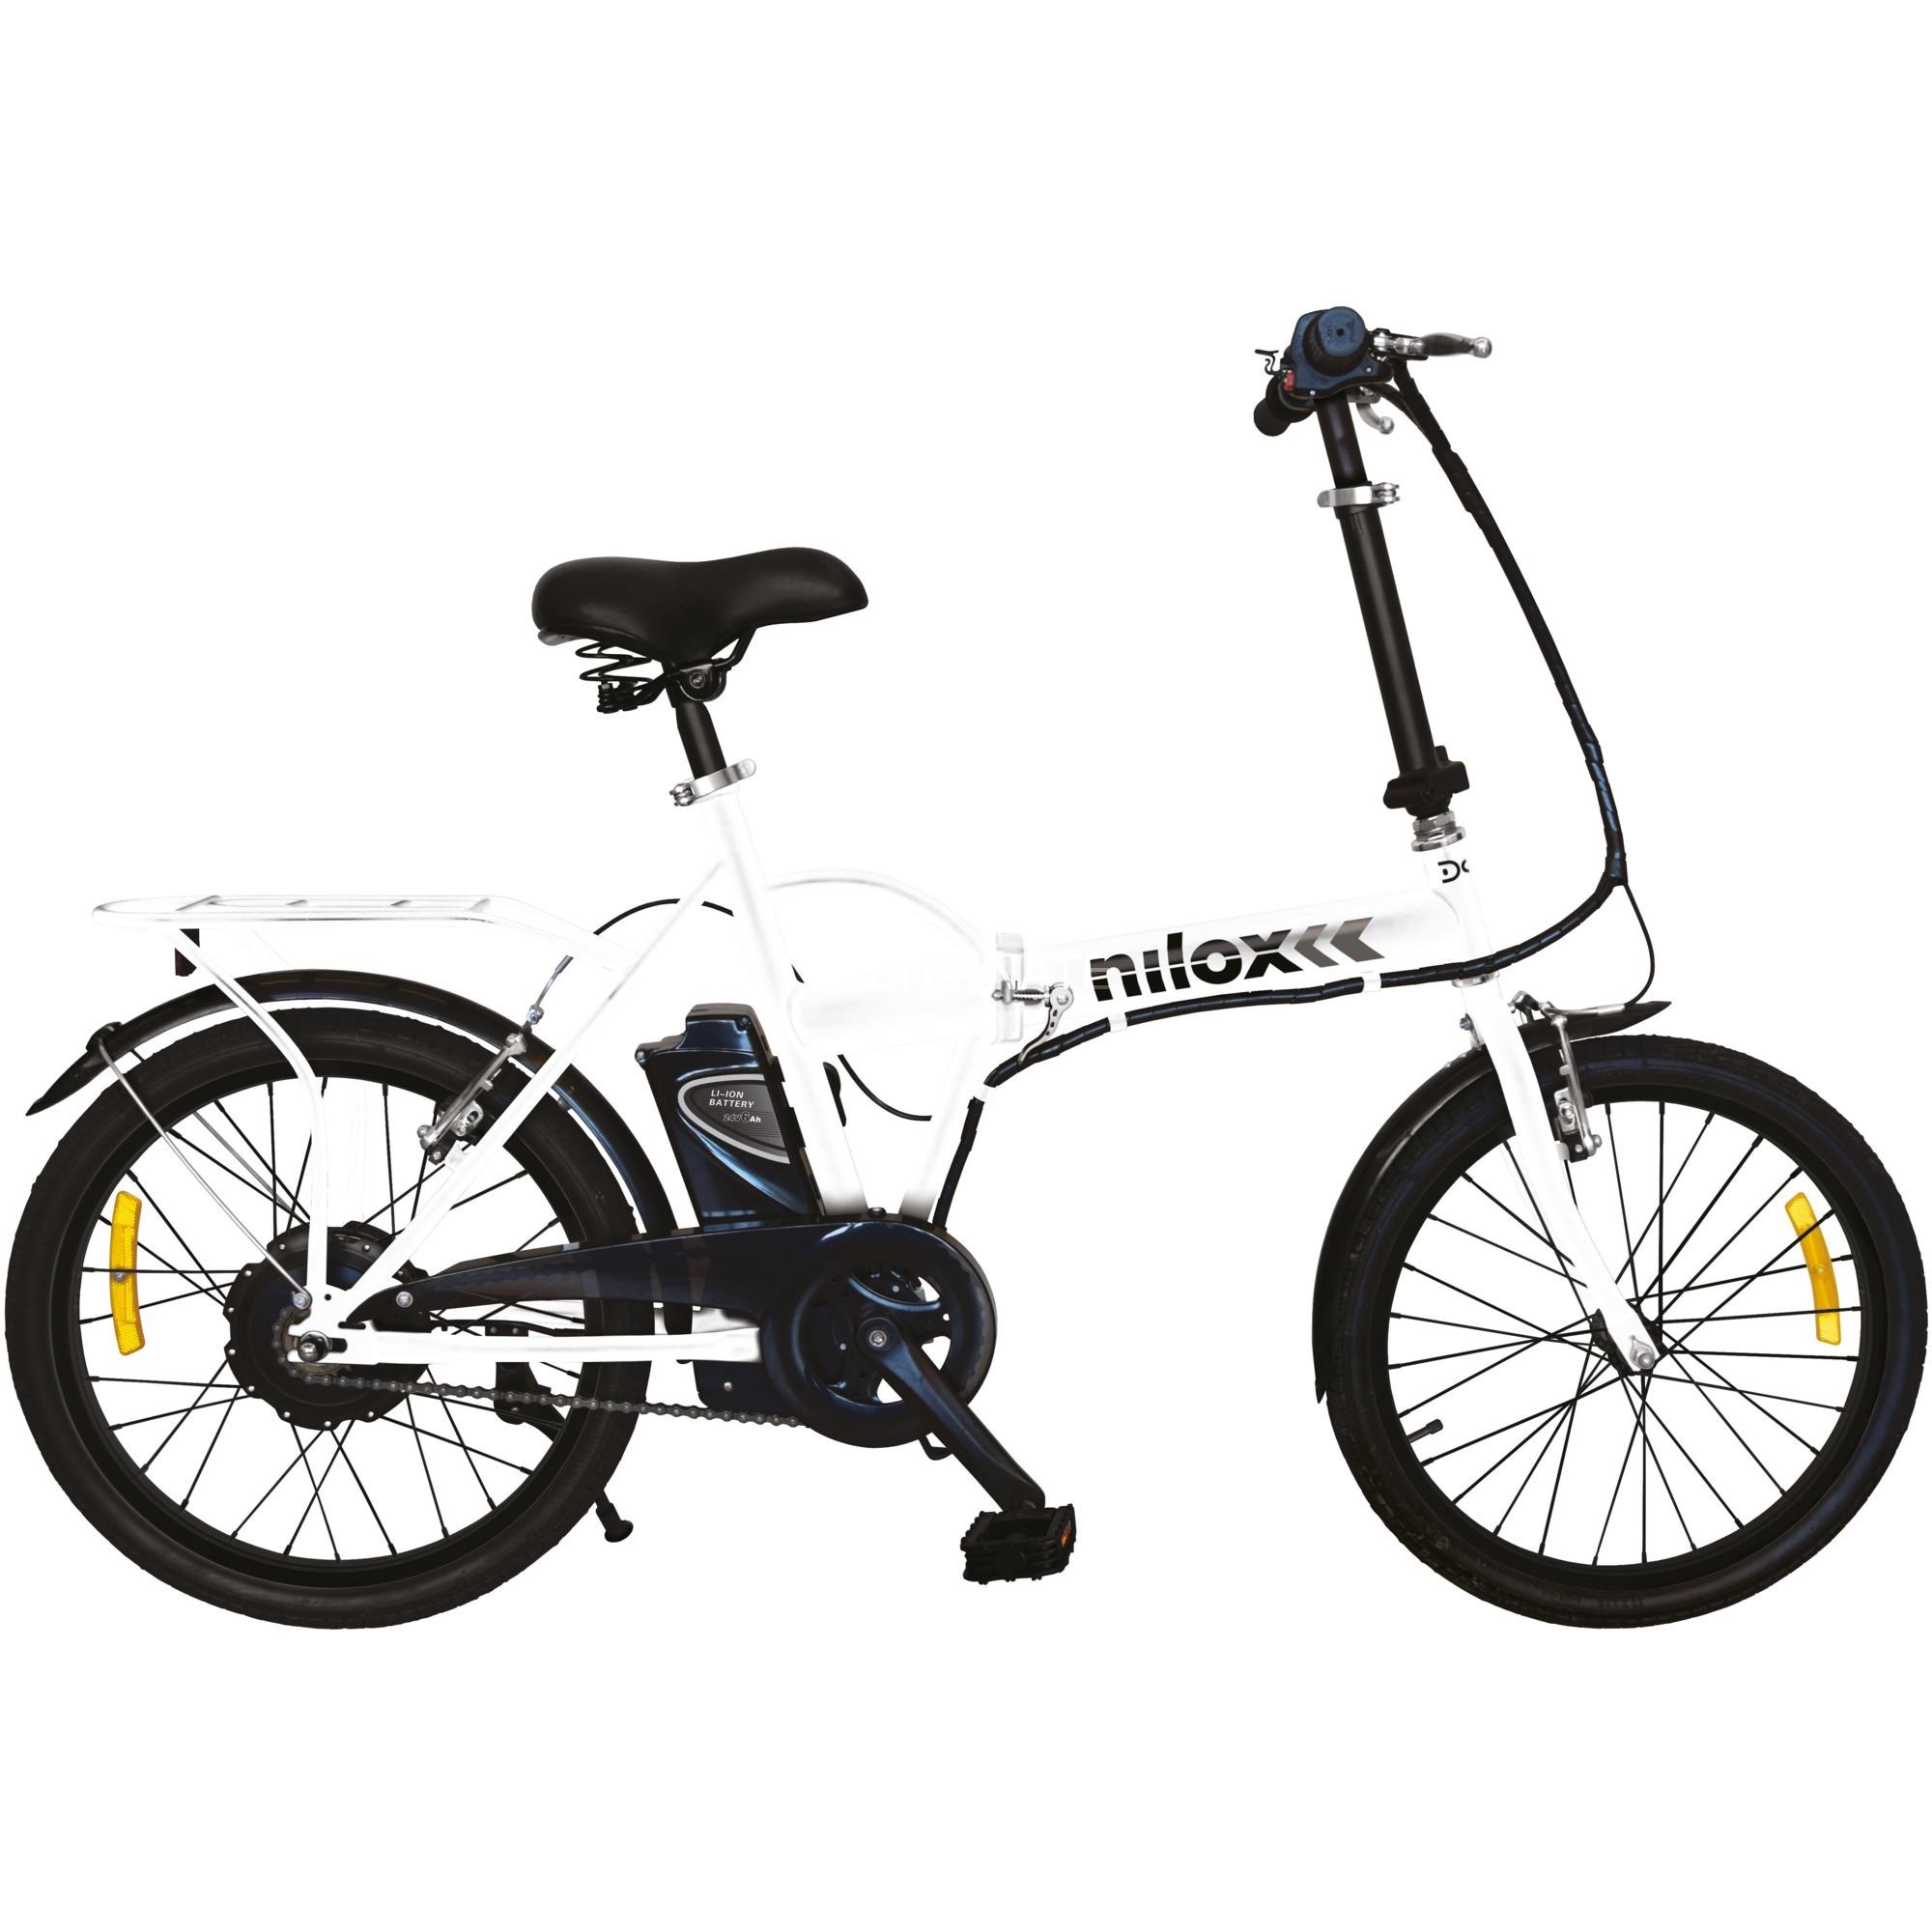 "DOC E-BIKE X1 Blanco Acero 20"" 20000g"